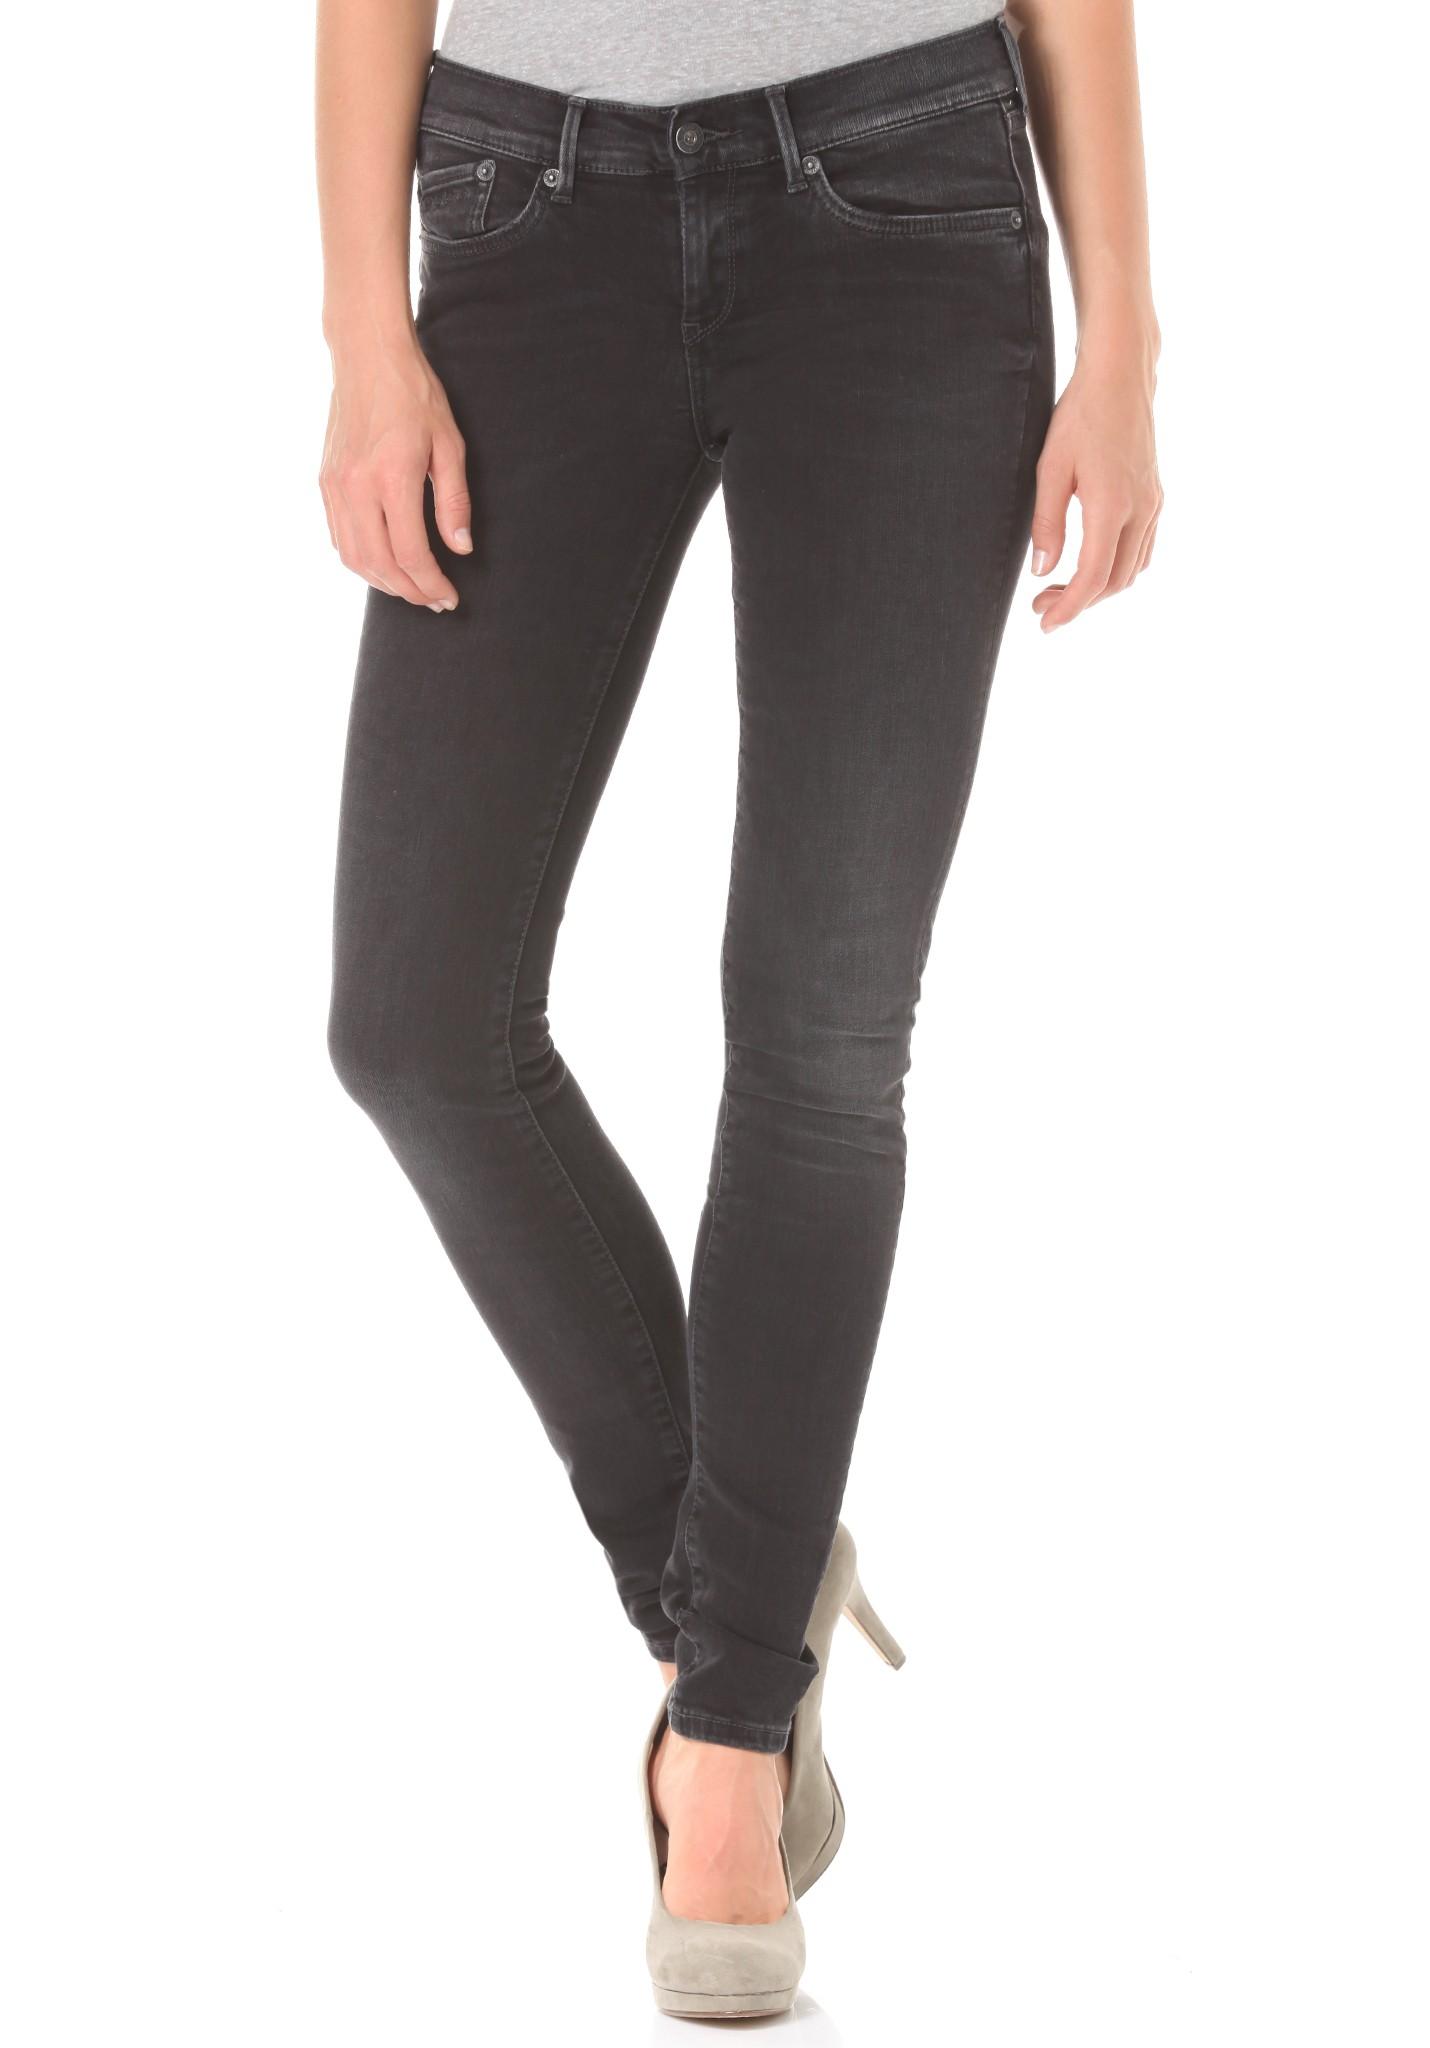 neu pepe jeans pixie damen jeans hose ebay. Black Bedroom Furniture Sets. Home Design Ideas